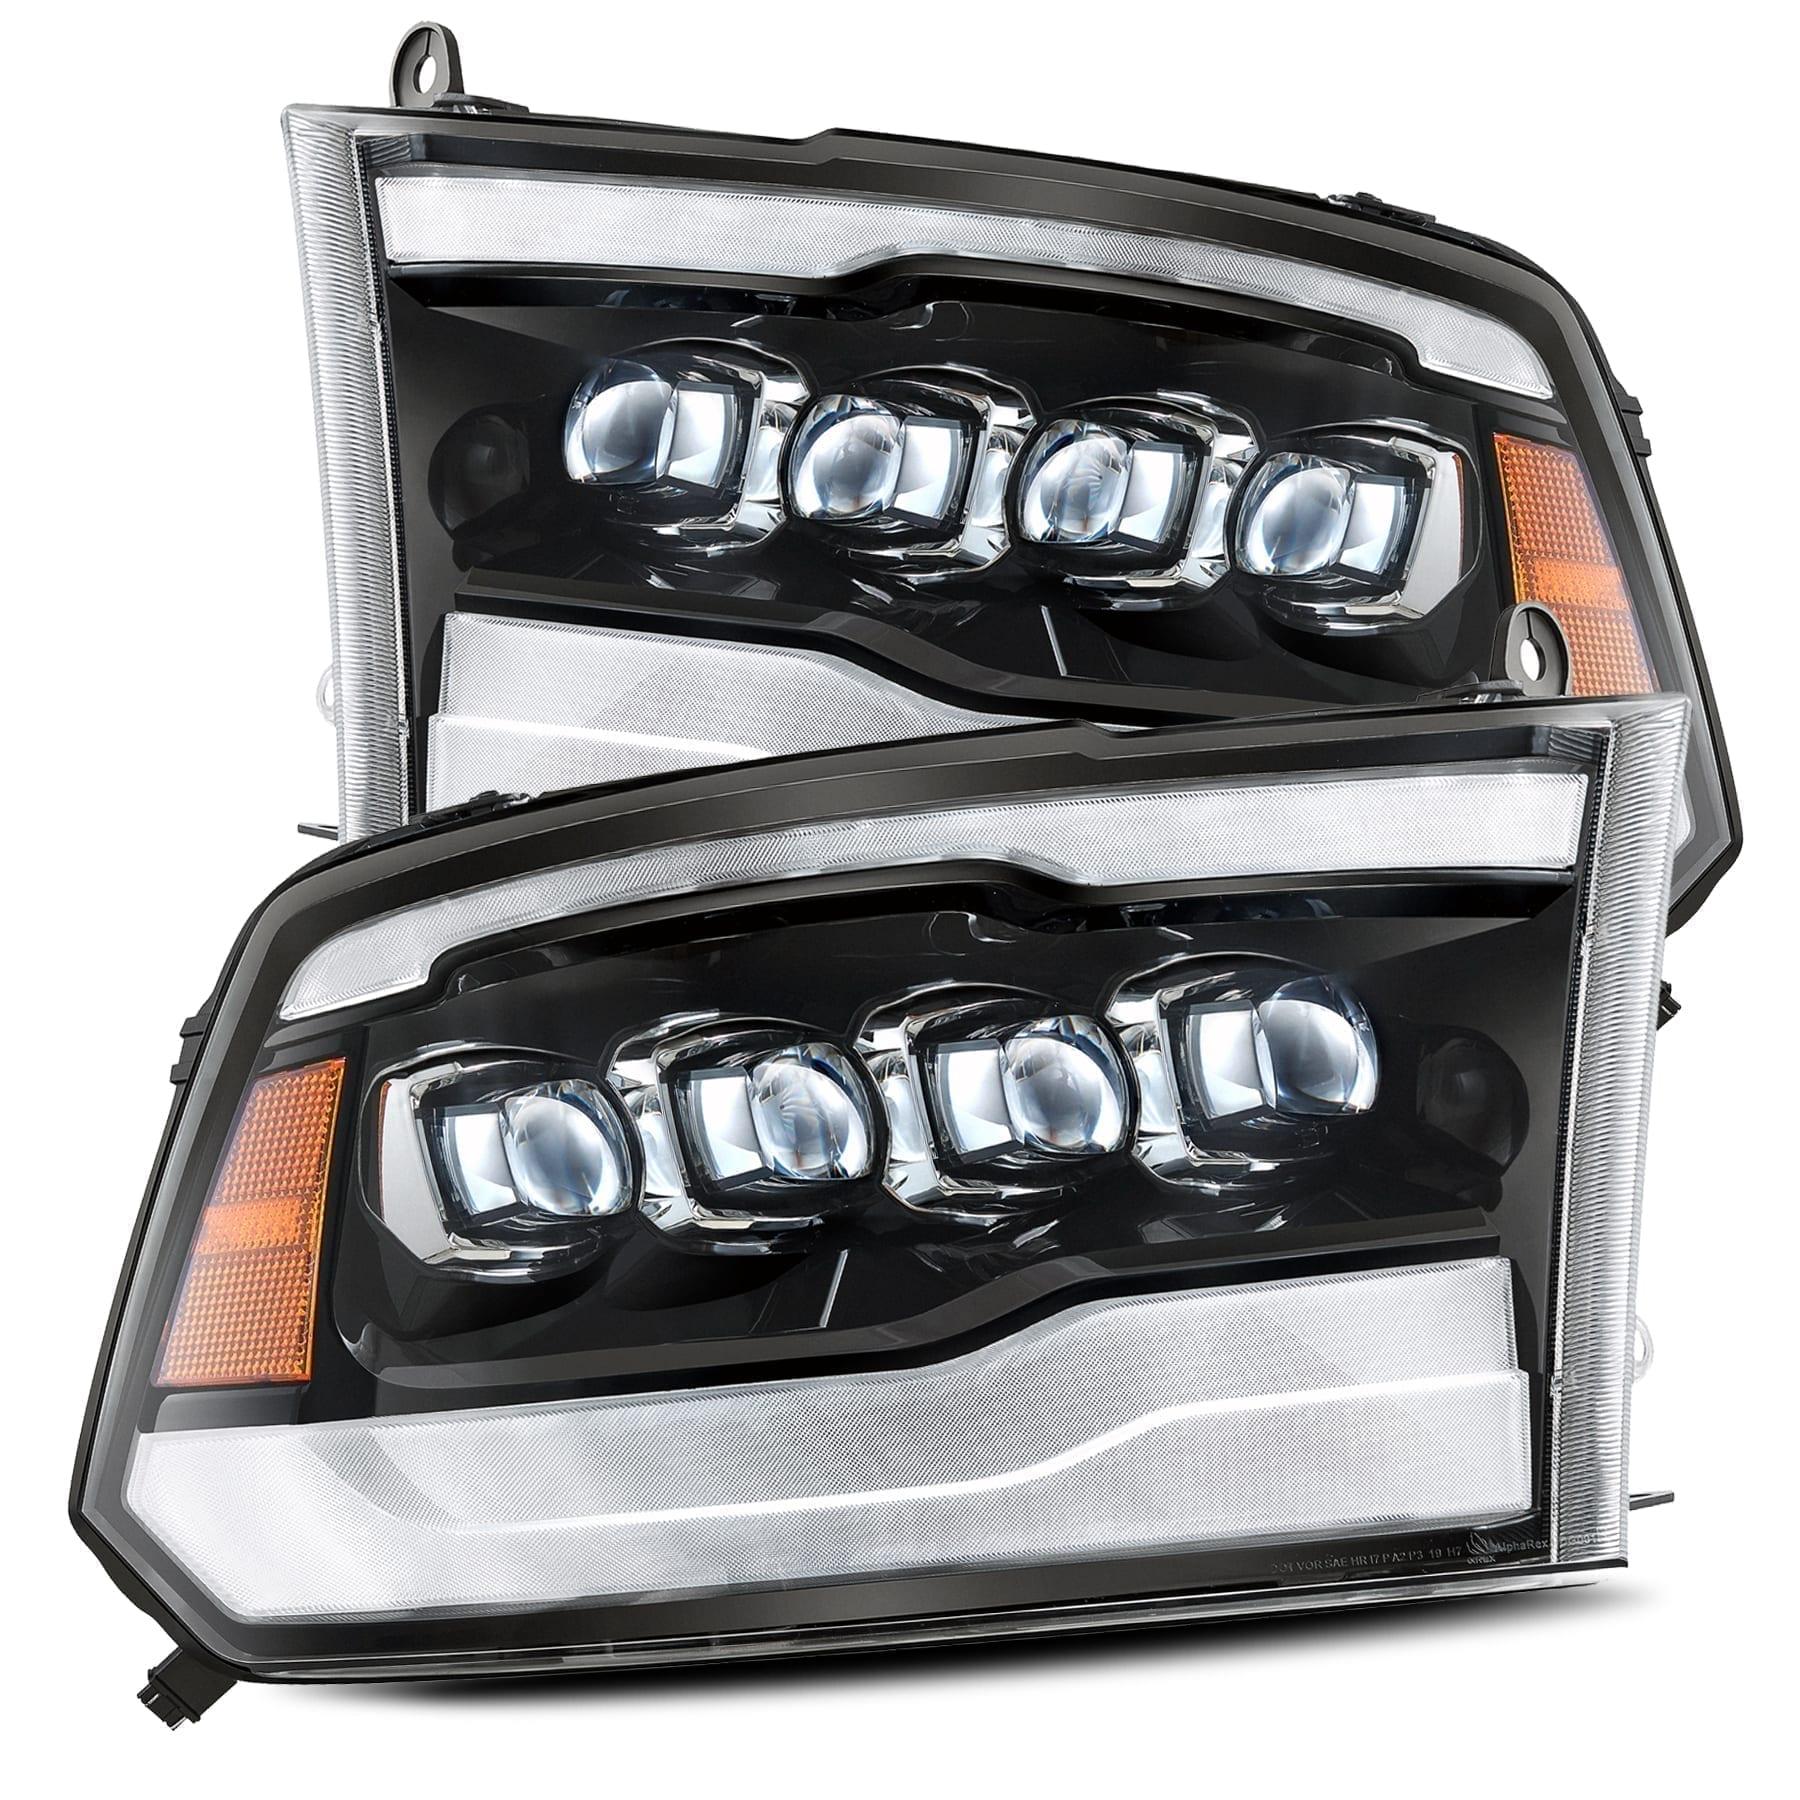 FOR 09-18 RAM TRUCK LEFT FACTORY STYLE HEADLIGHT LAMP ASSEMBLY 12 13 14 15 16 17